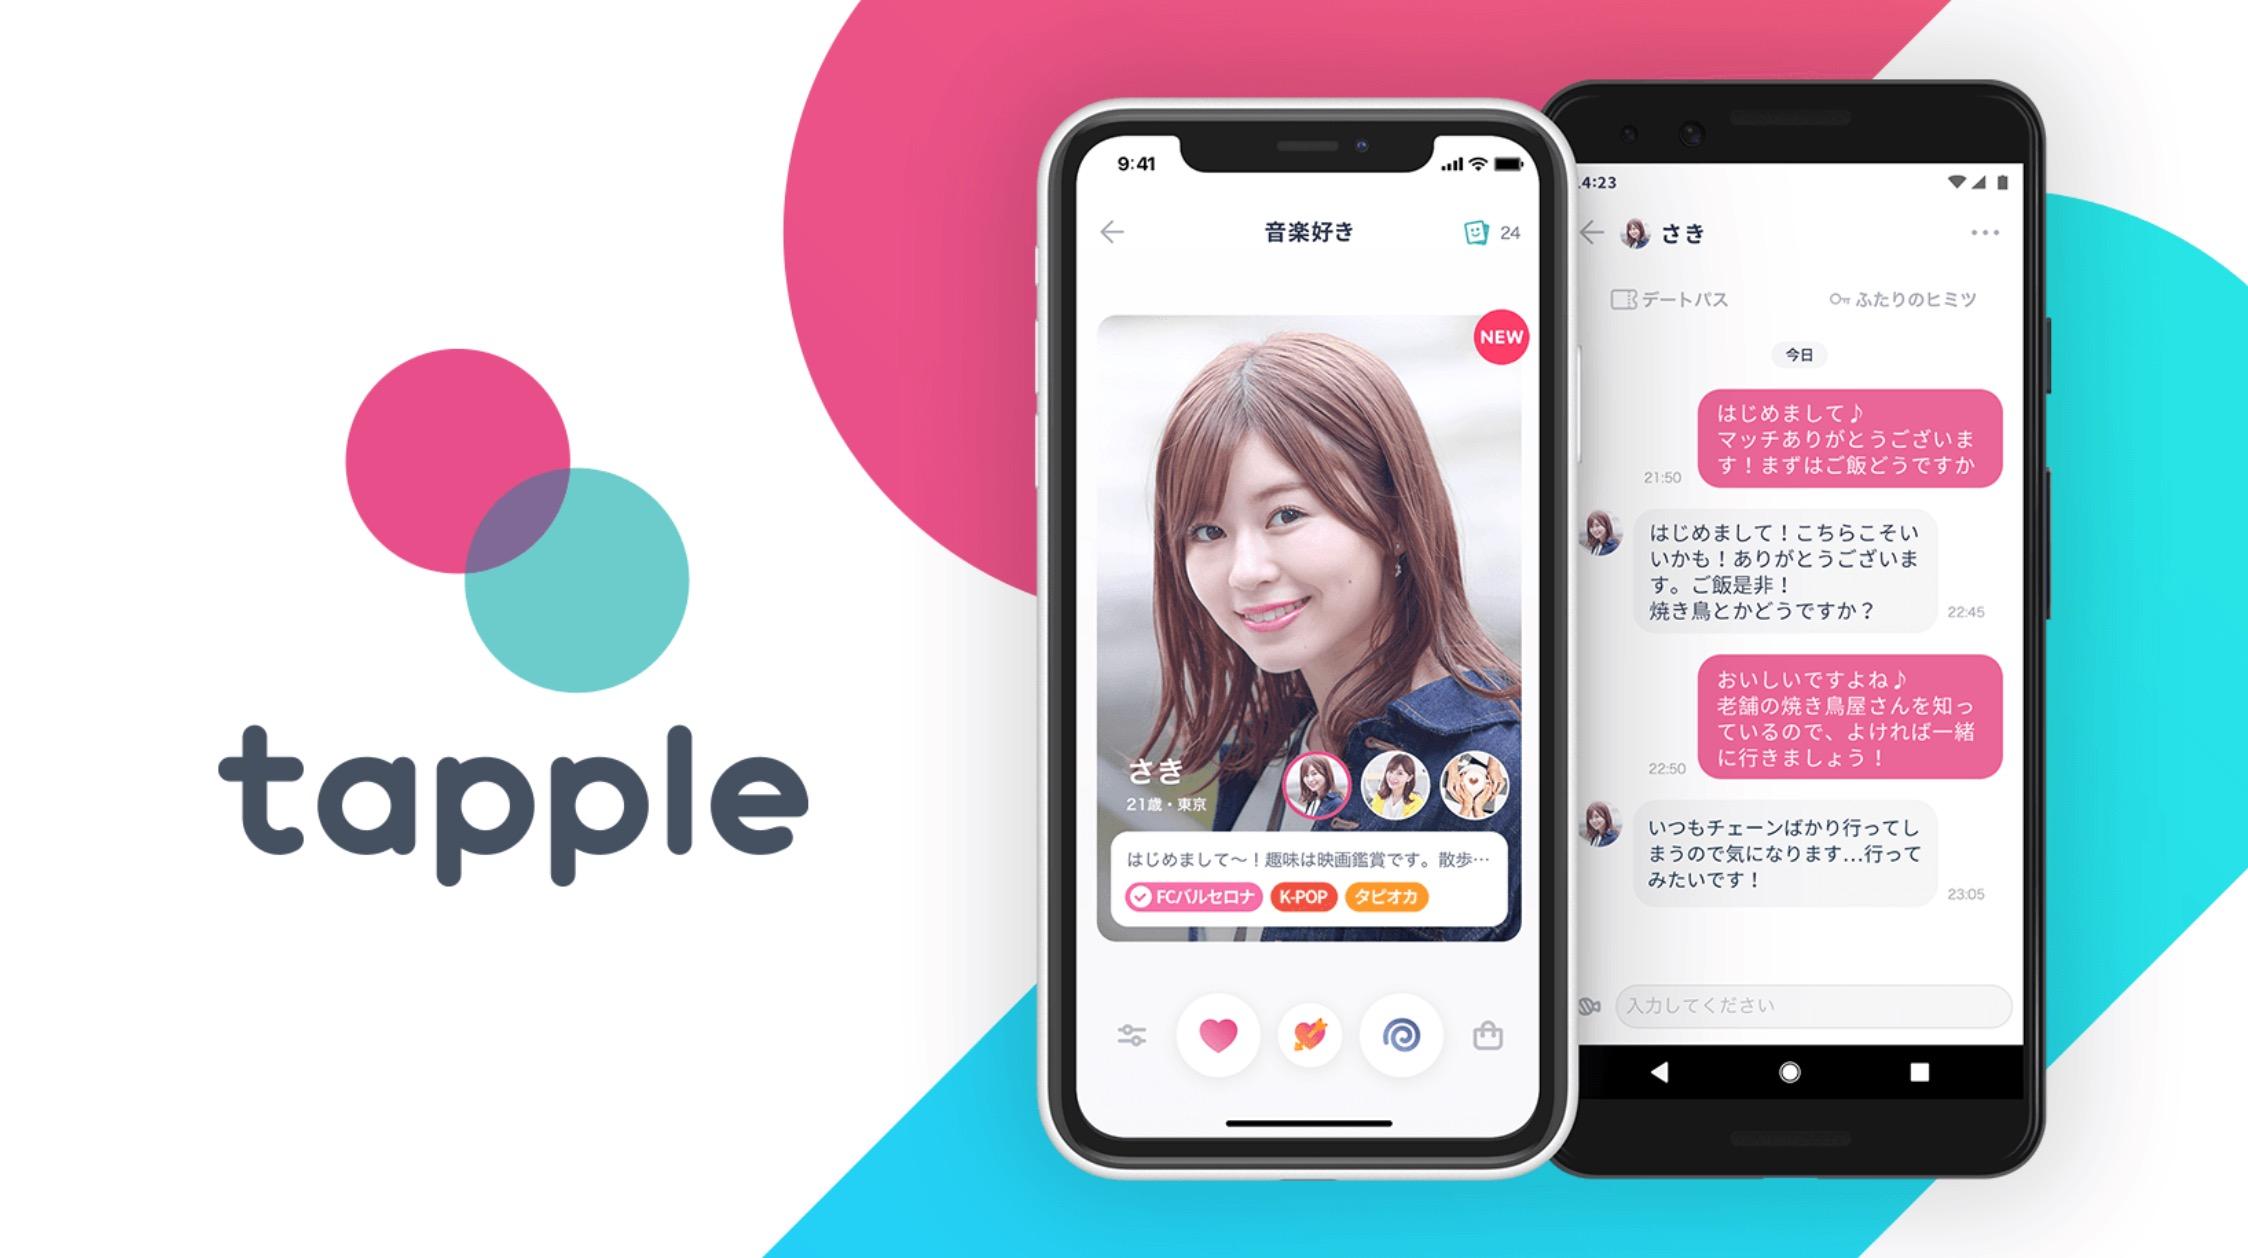 Tapple app